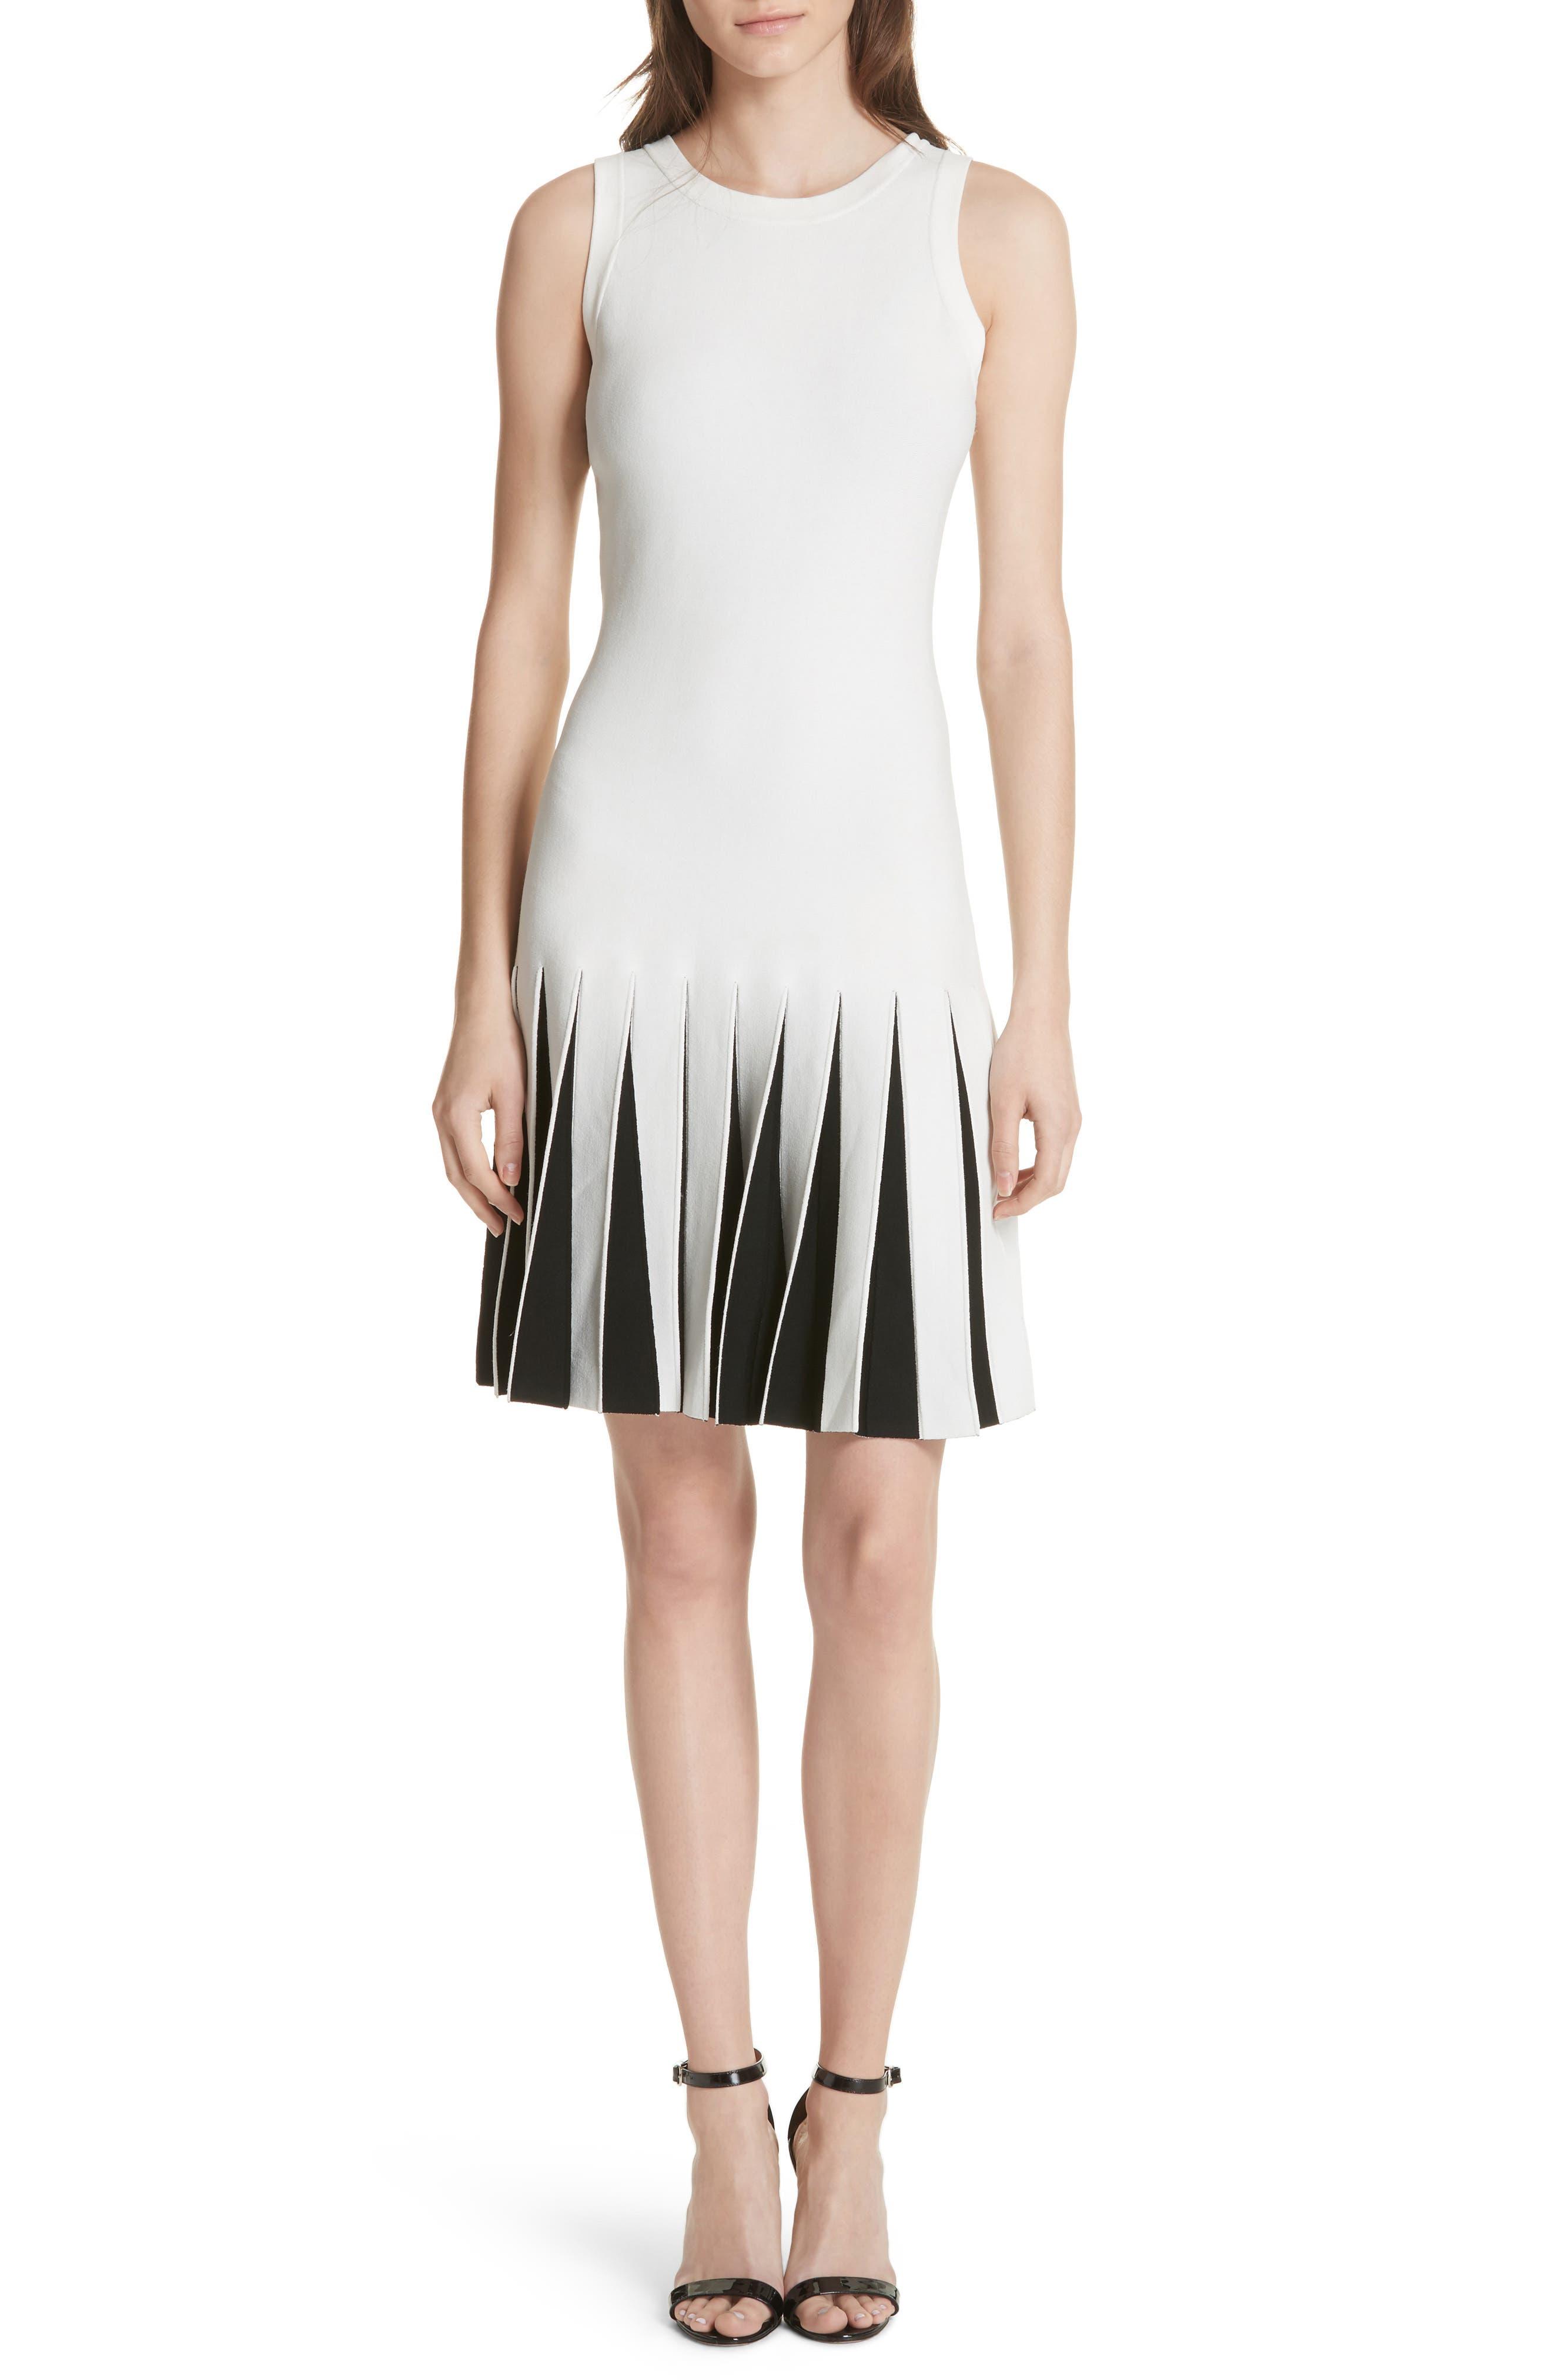 Milly Pleated Contrast Drop Waist Dress